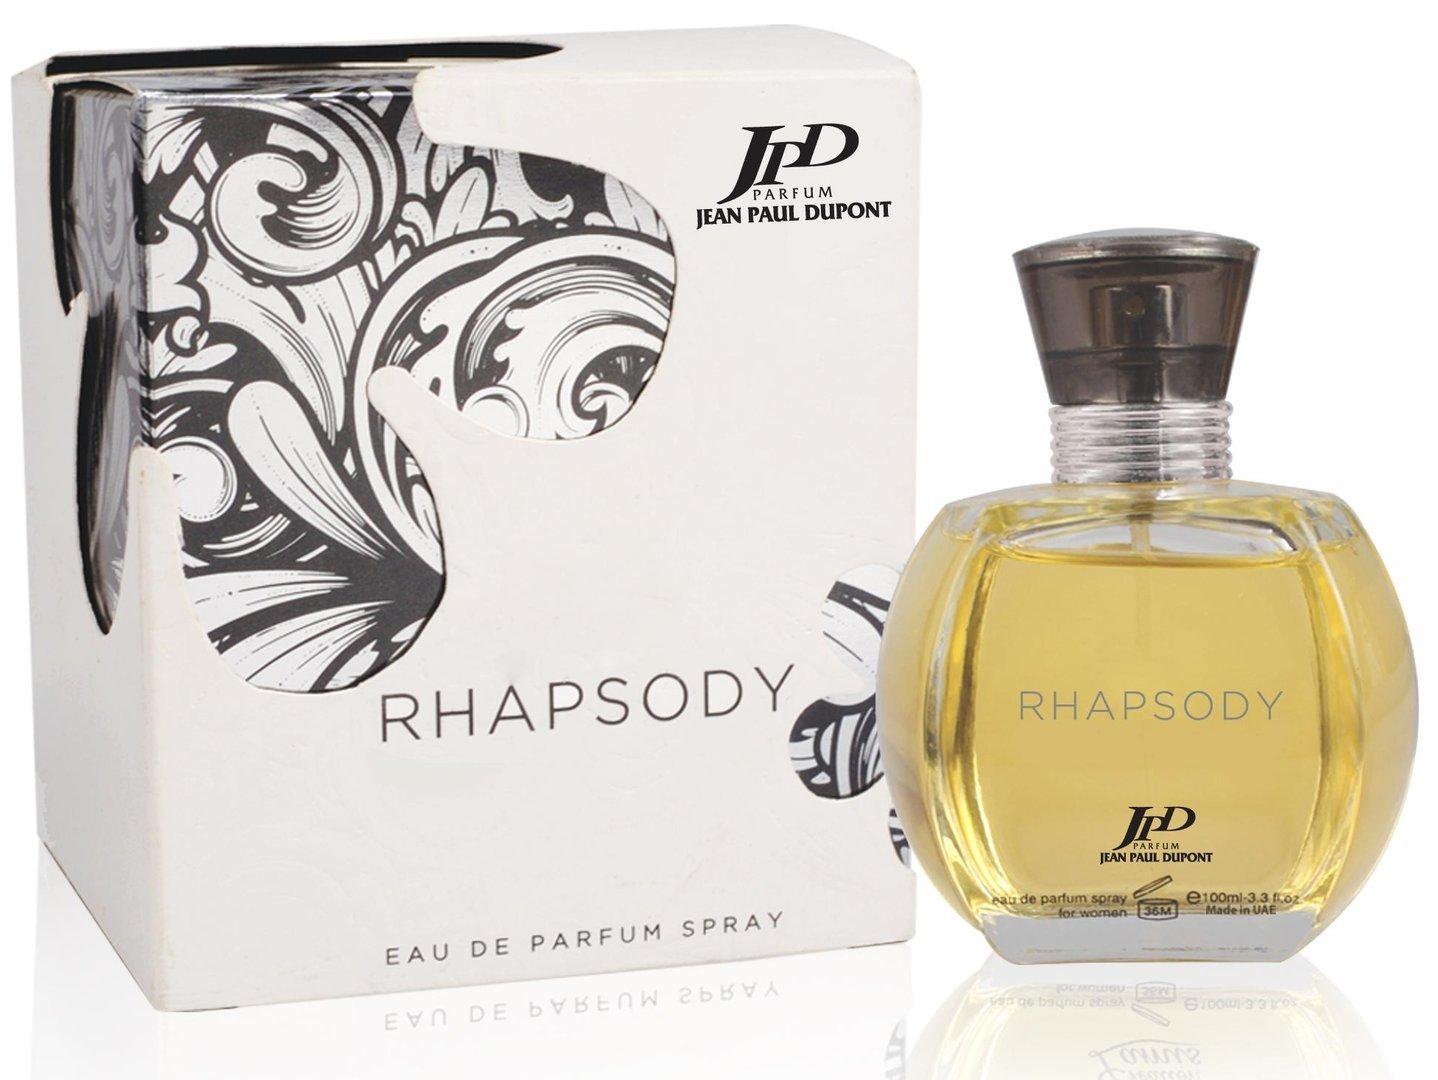 Rhapsody HerAmazon Jean Paul De 100ml Spray Dupont For Eau Parfum wOXiuPTkZ